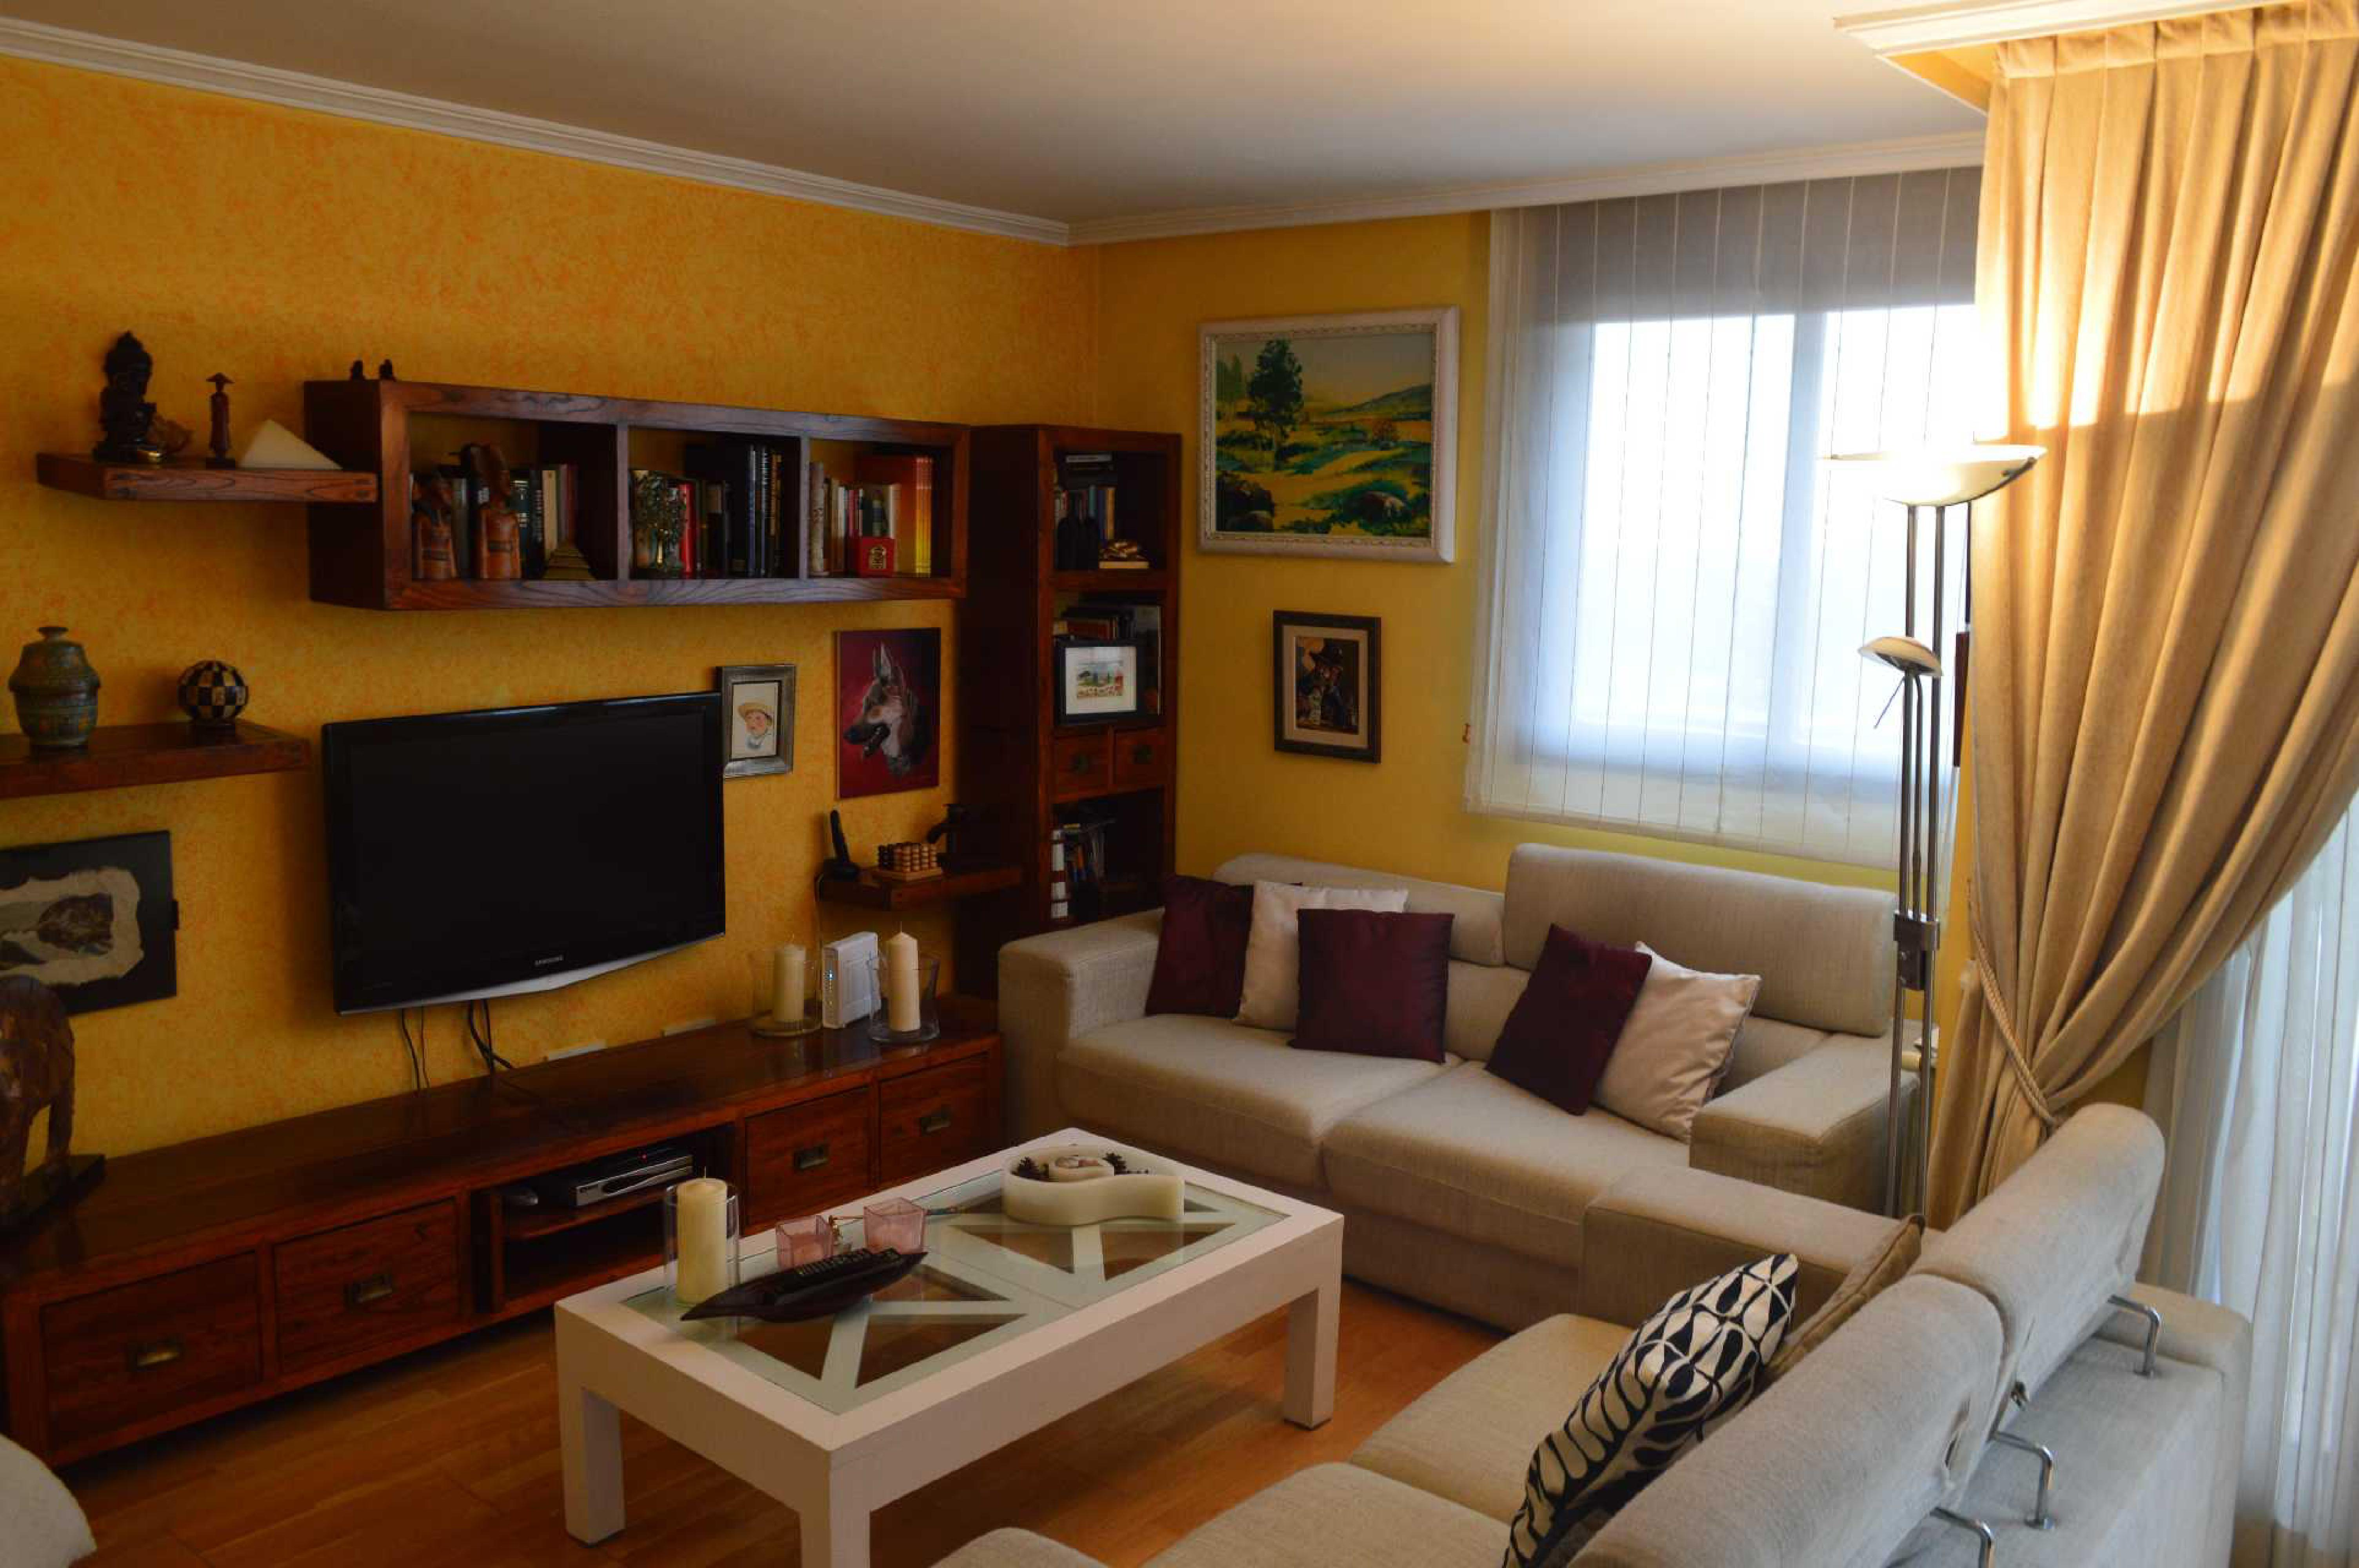 Inmoonline tres cantos inmobiliaria 3c pisos chalets - Chalets tres cantos ...